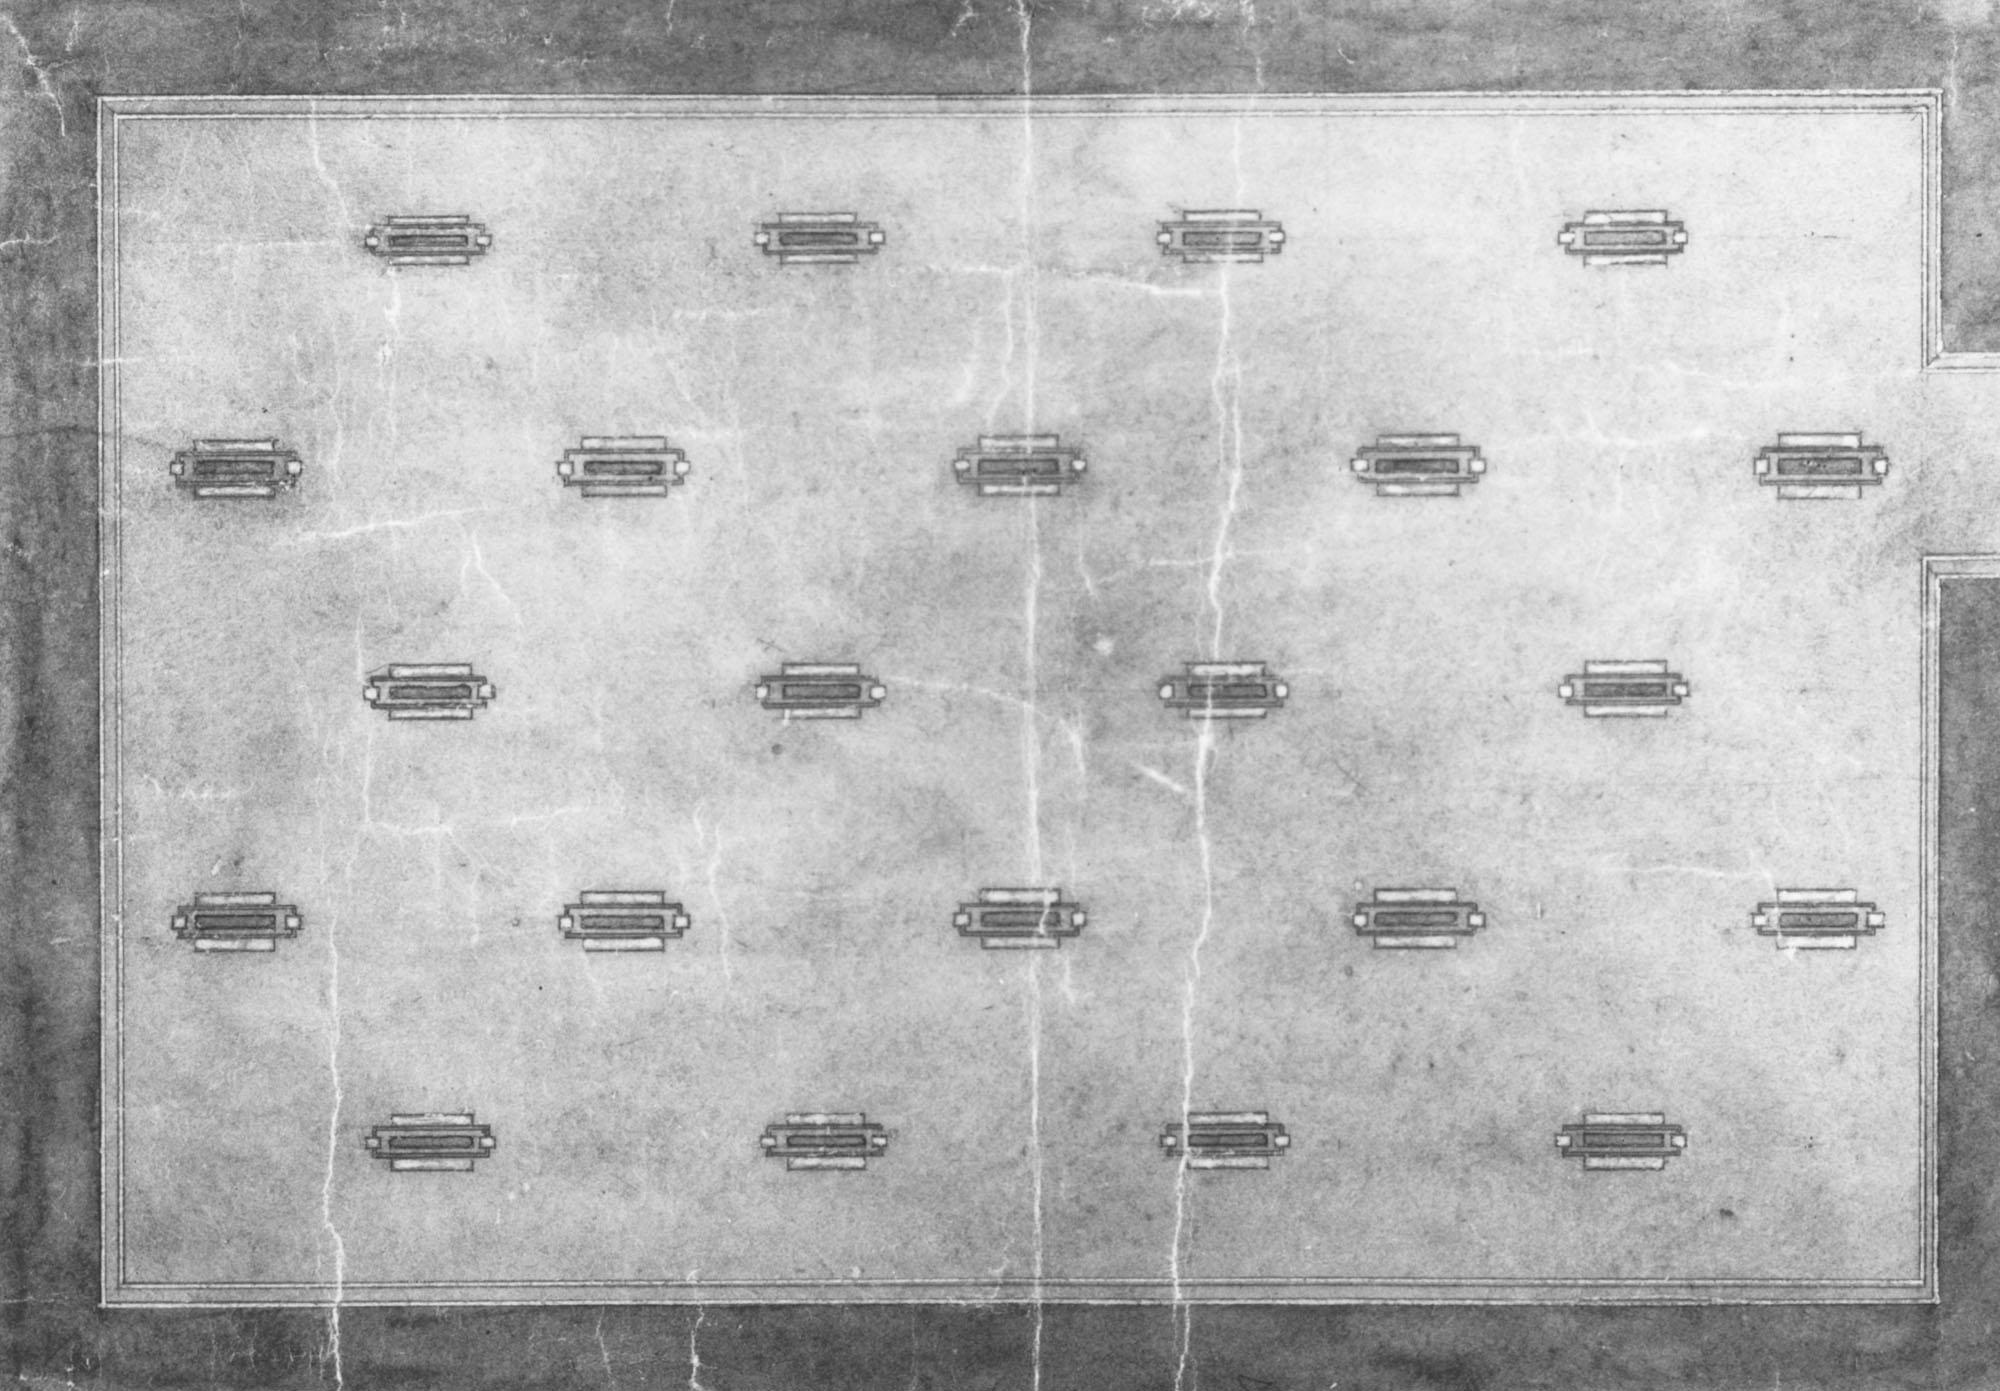 Footprints and Floorplans